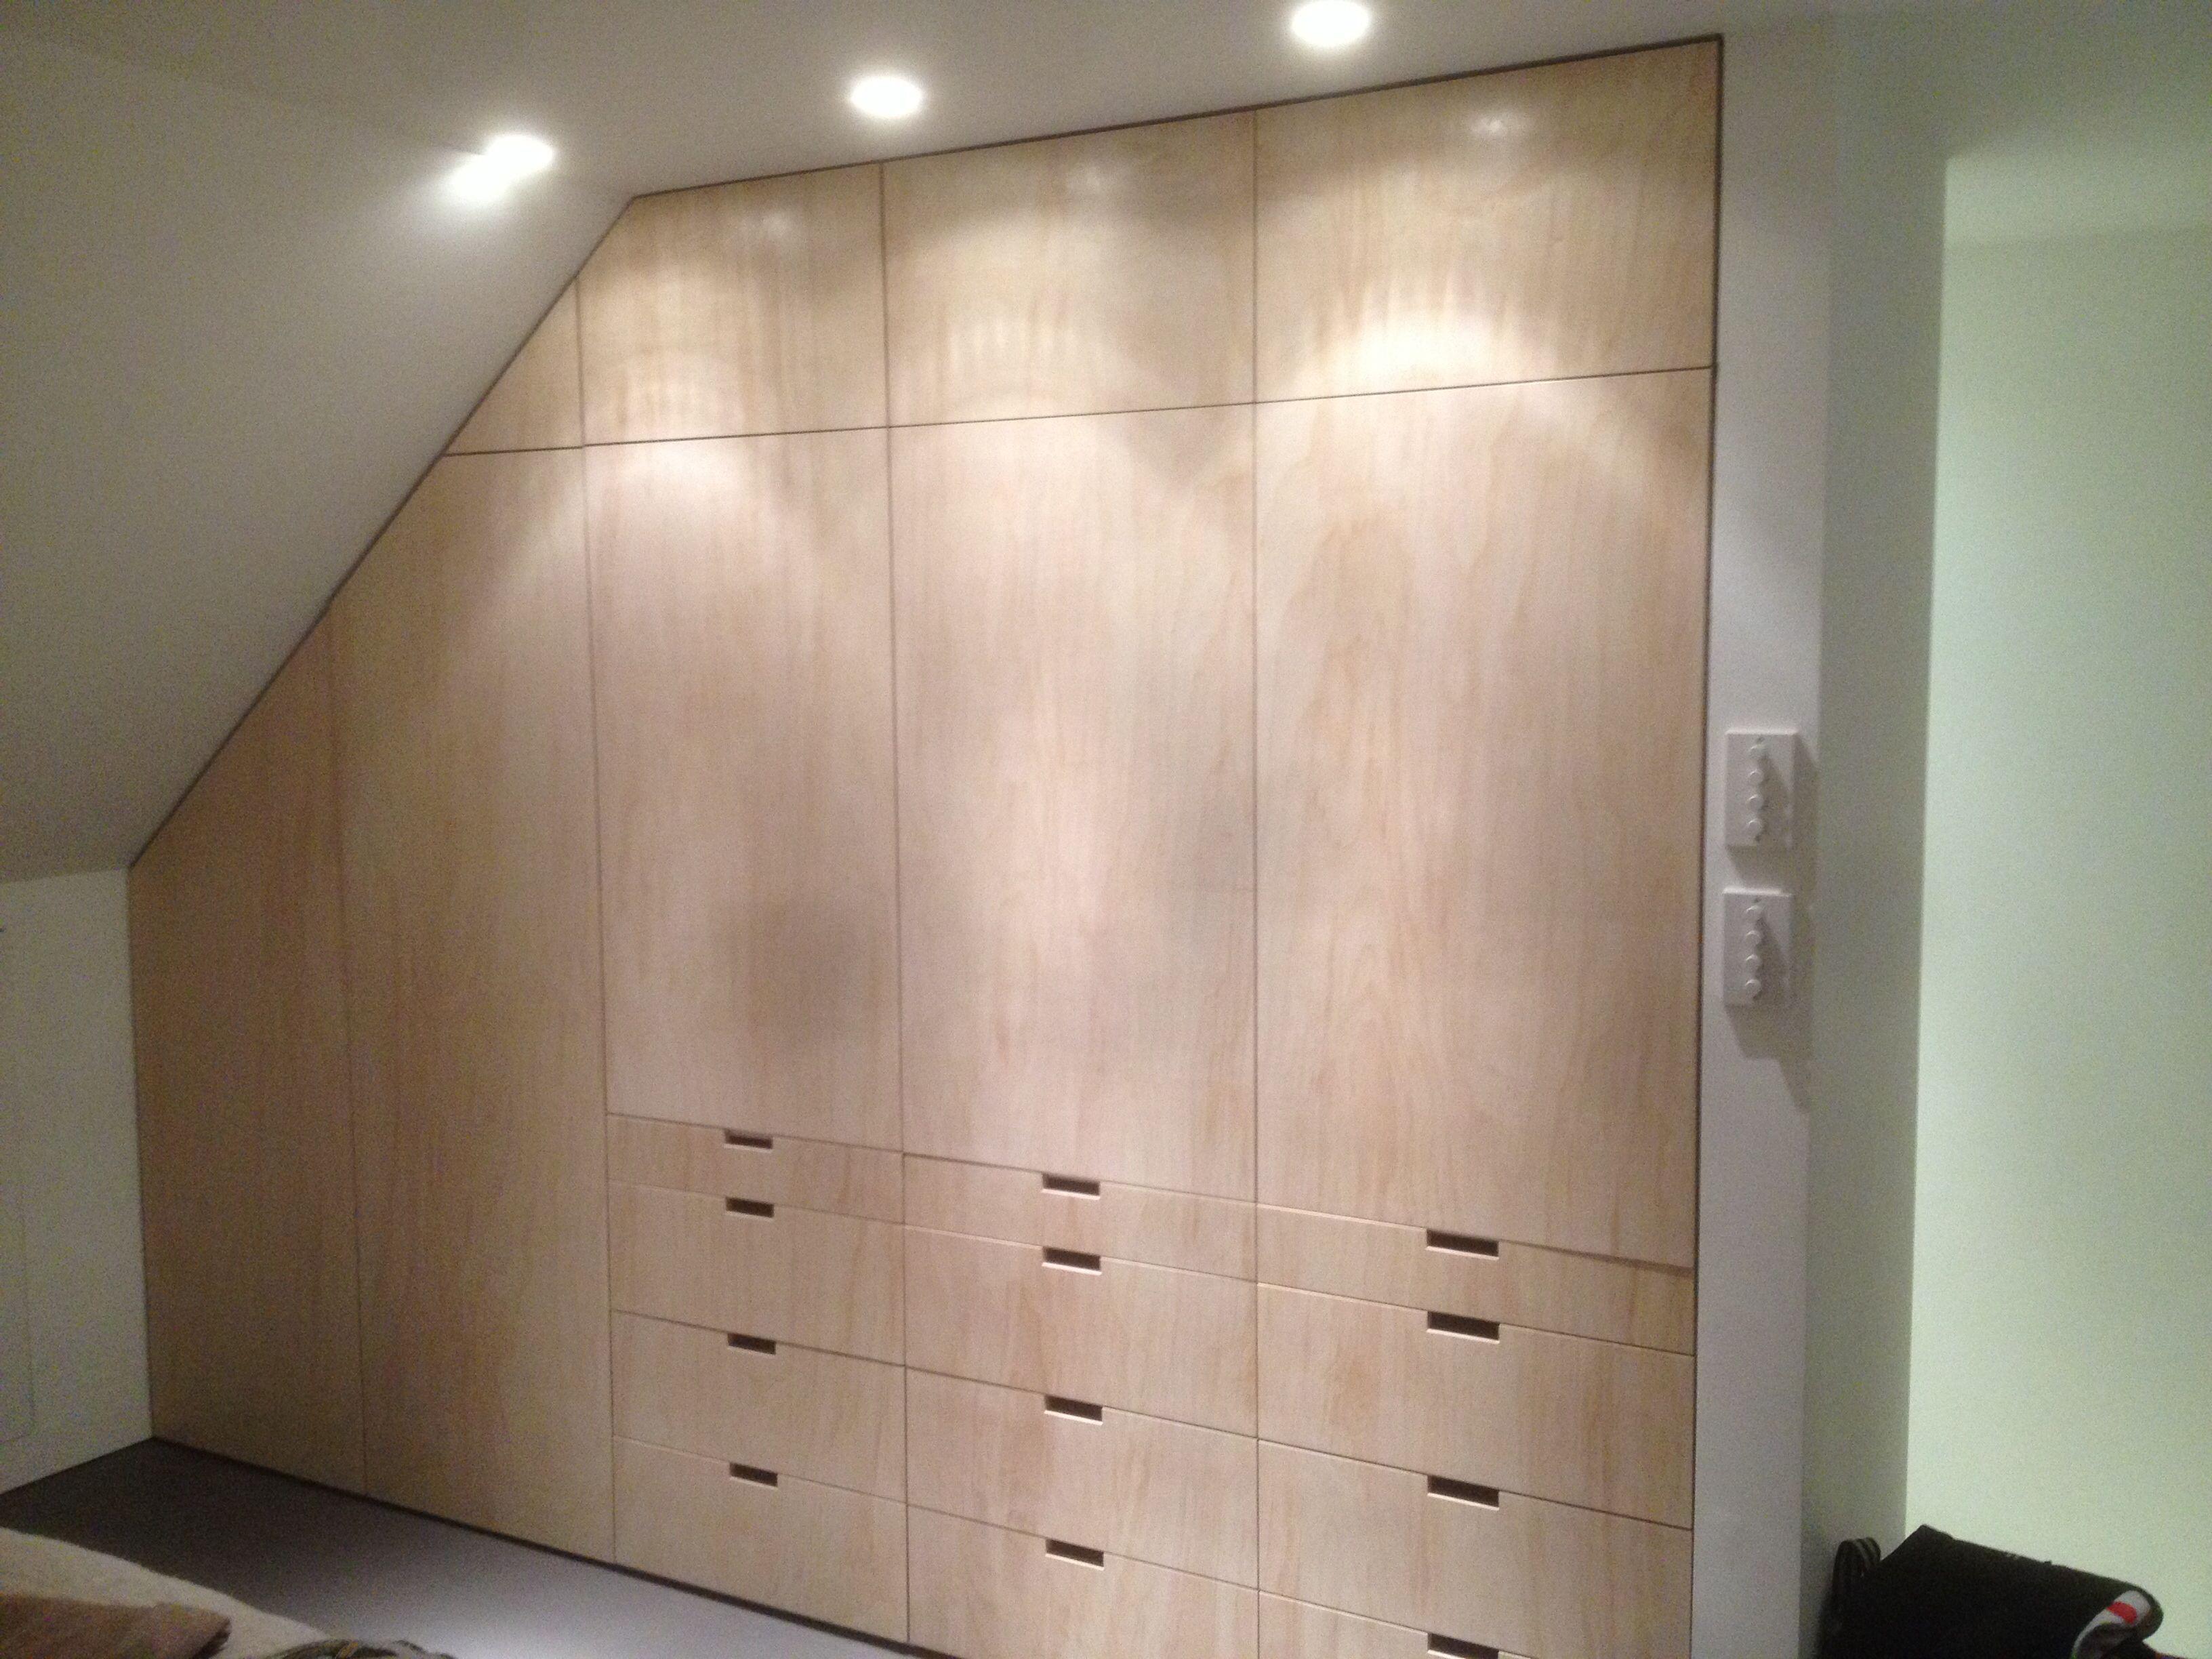 Birch Ply Wardrobe By Fine Balance Carpentry Idea 39 S